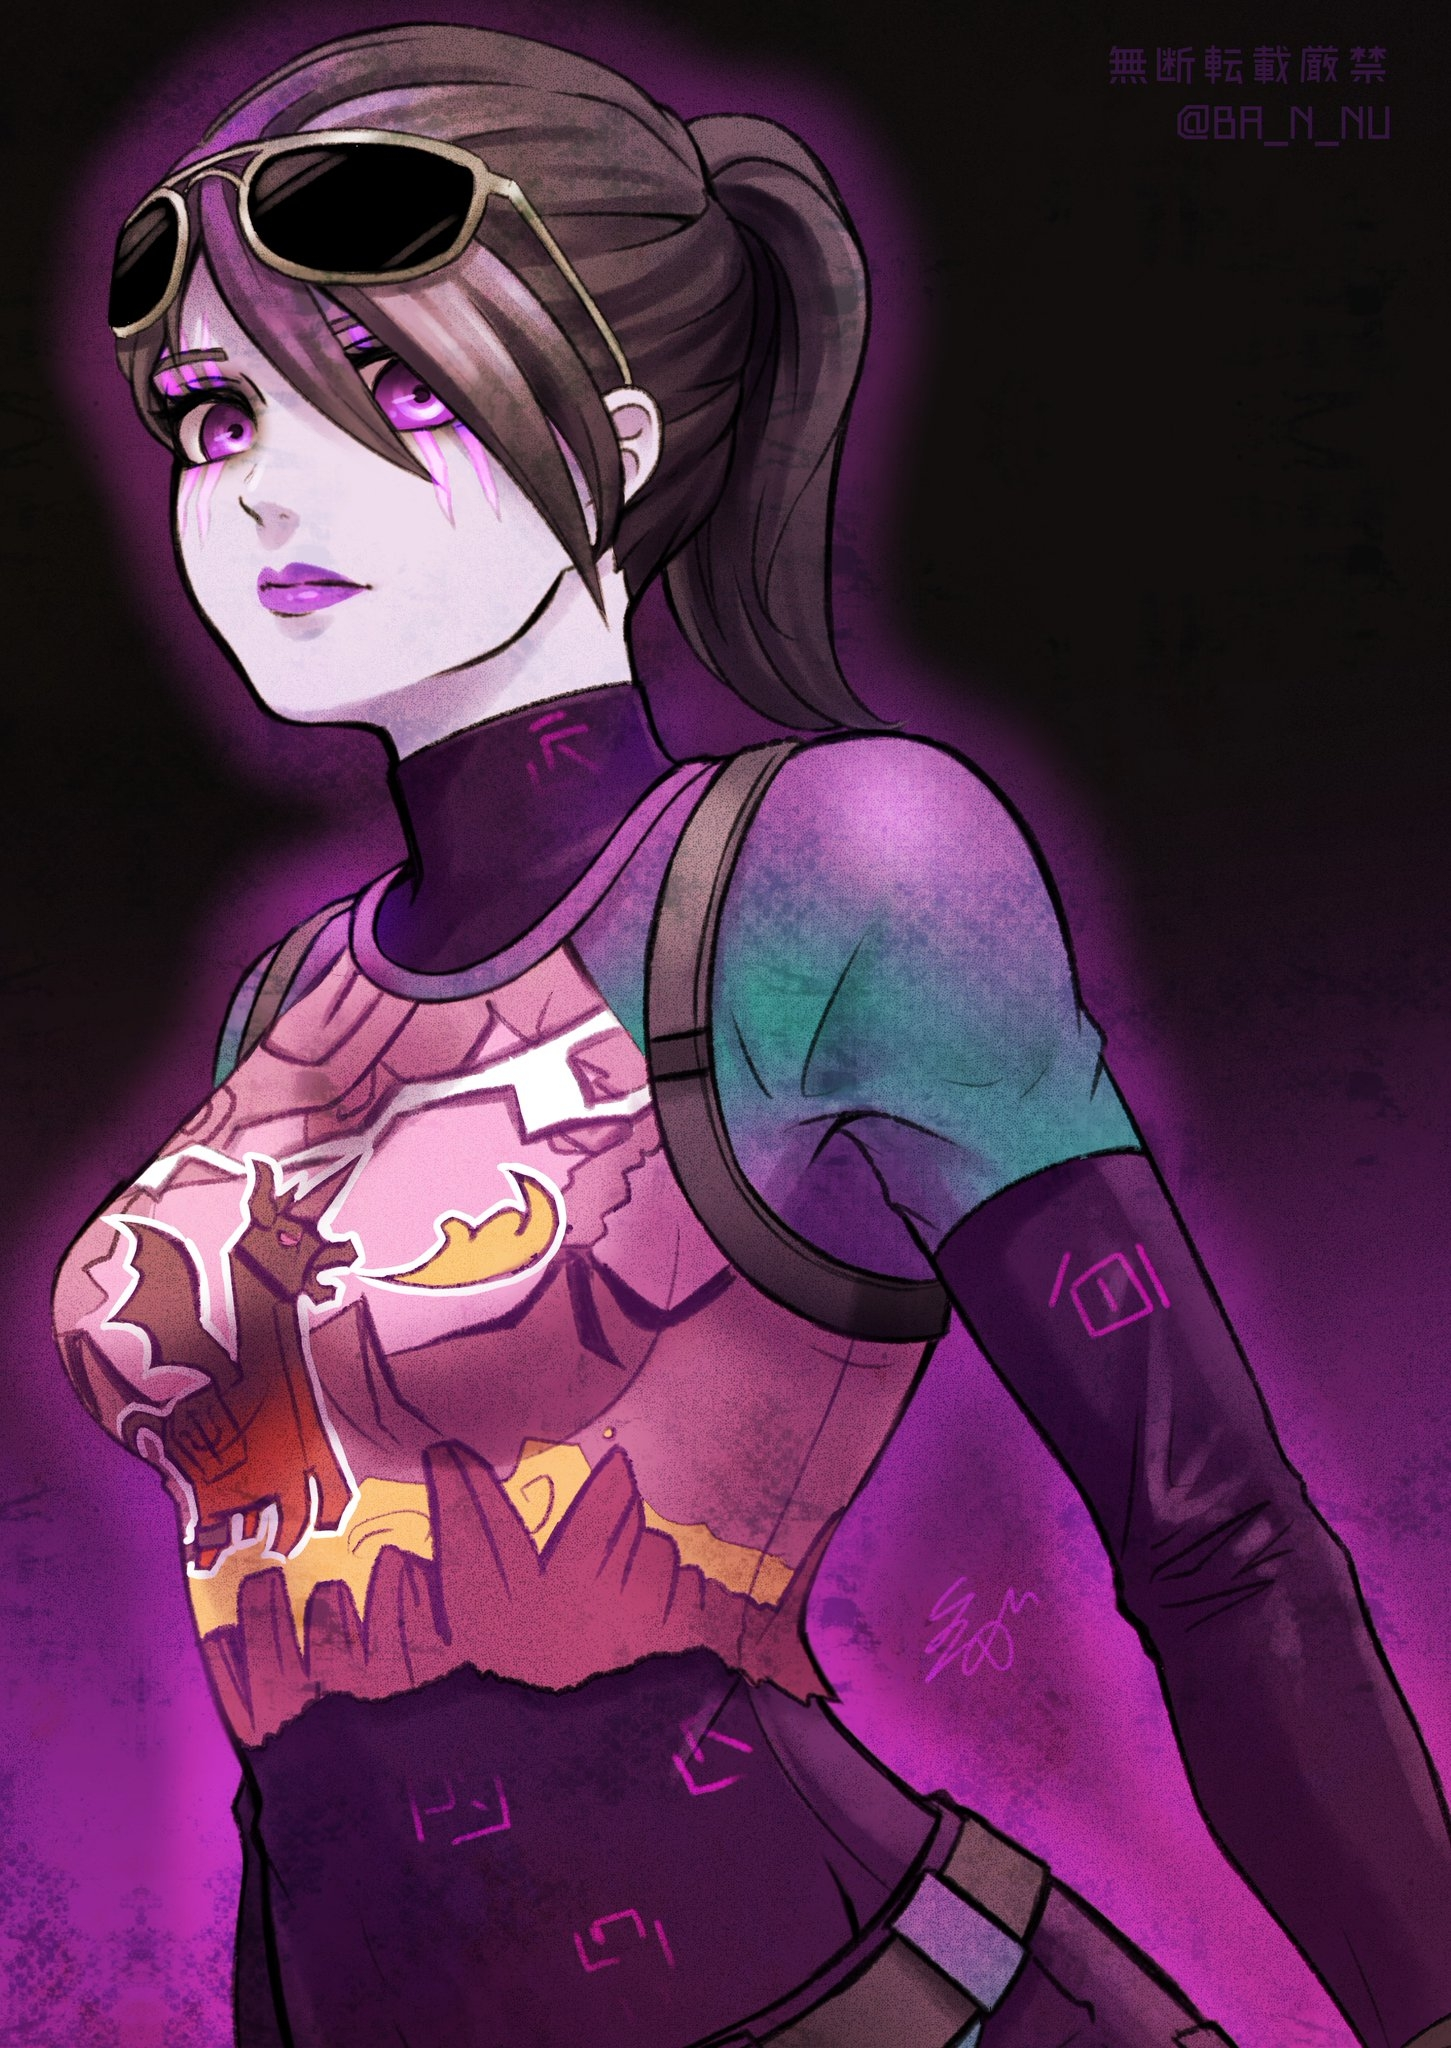 tags anime pixiv id 36673439 fortnite dark bomber purple skin - fortnite dark bomber art